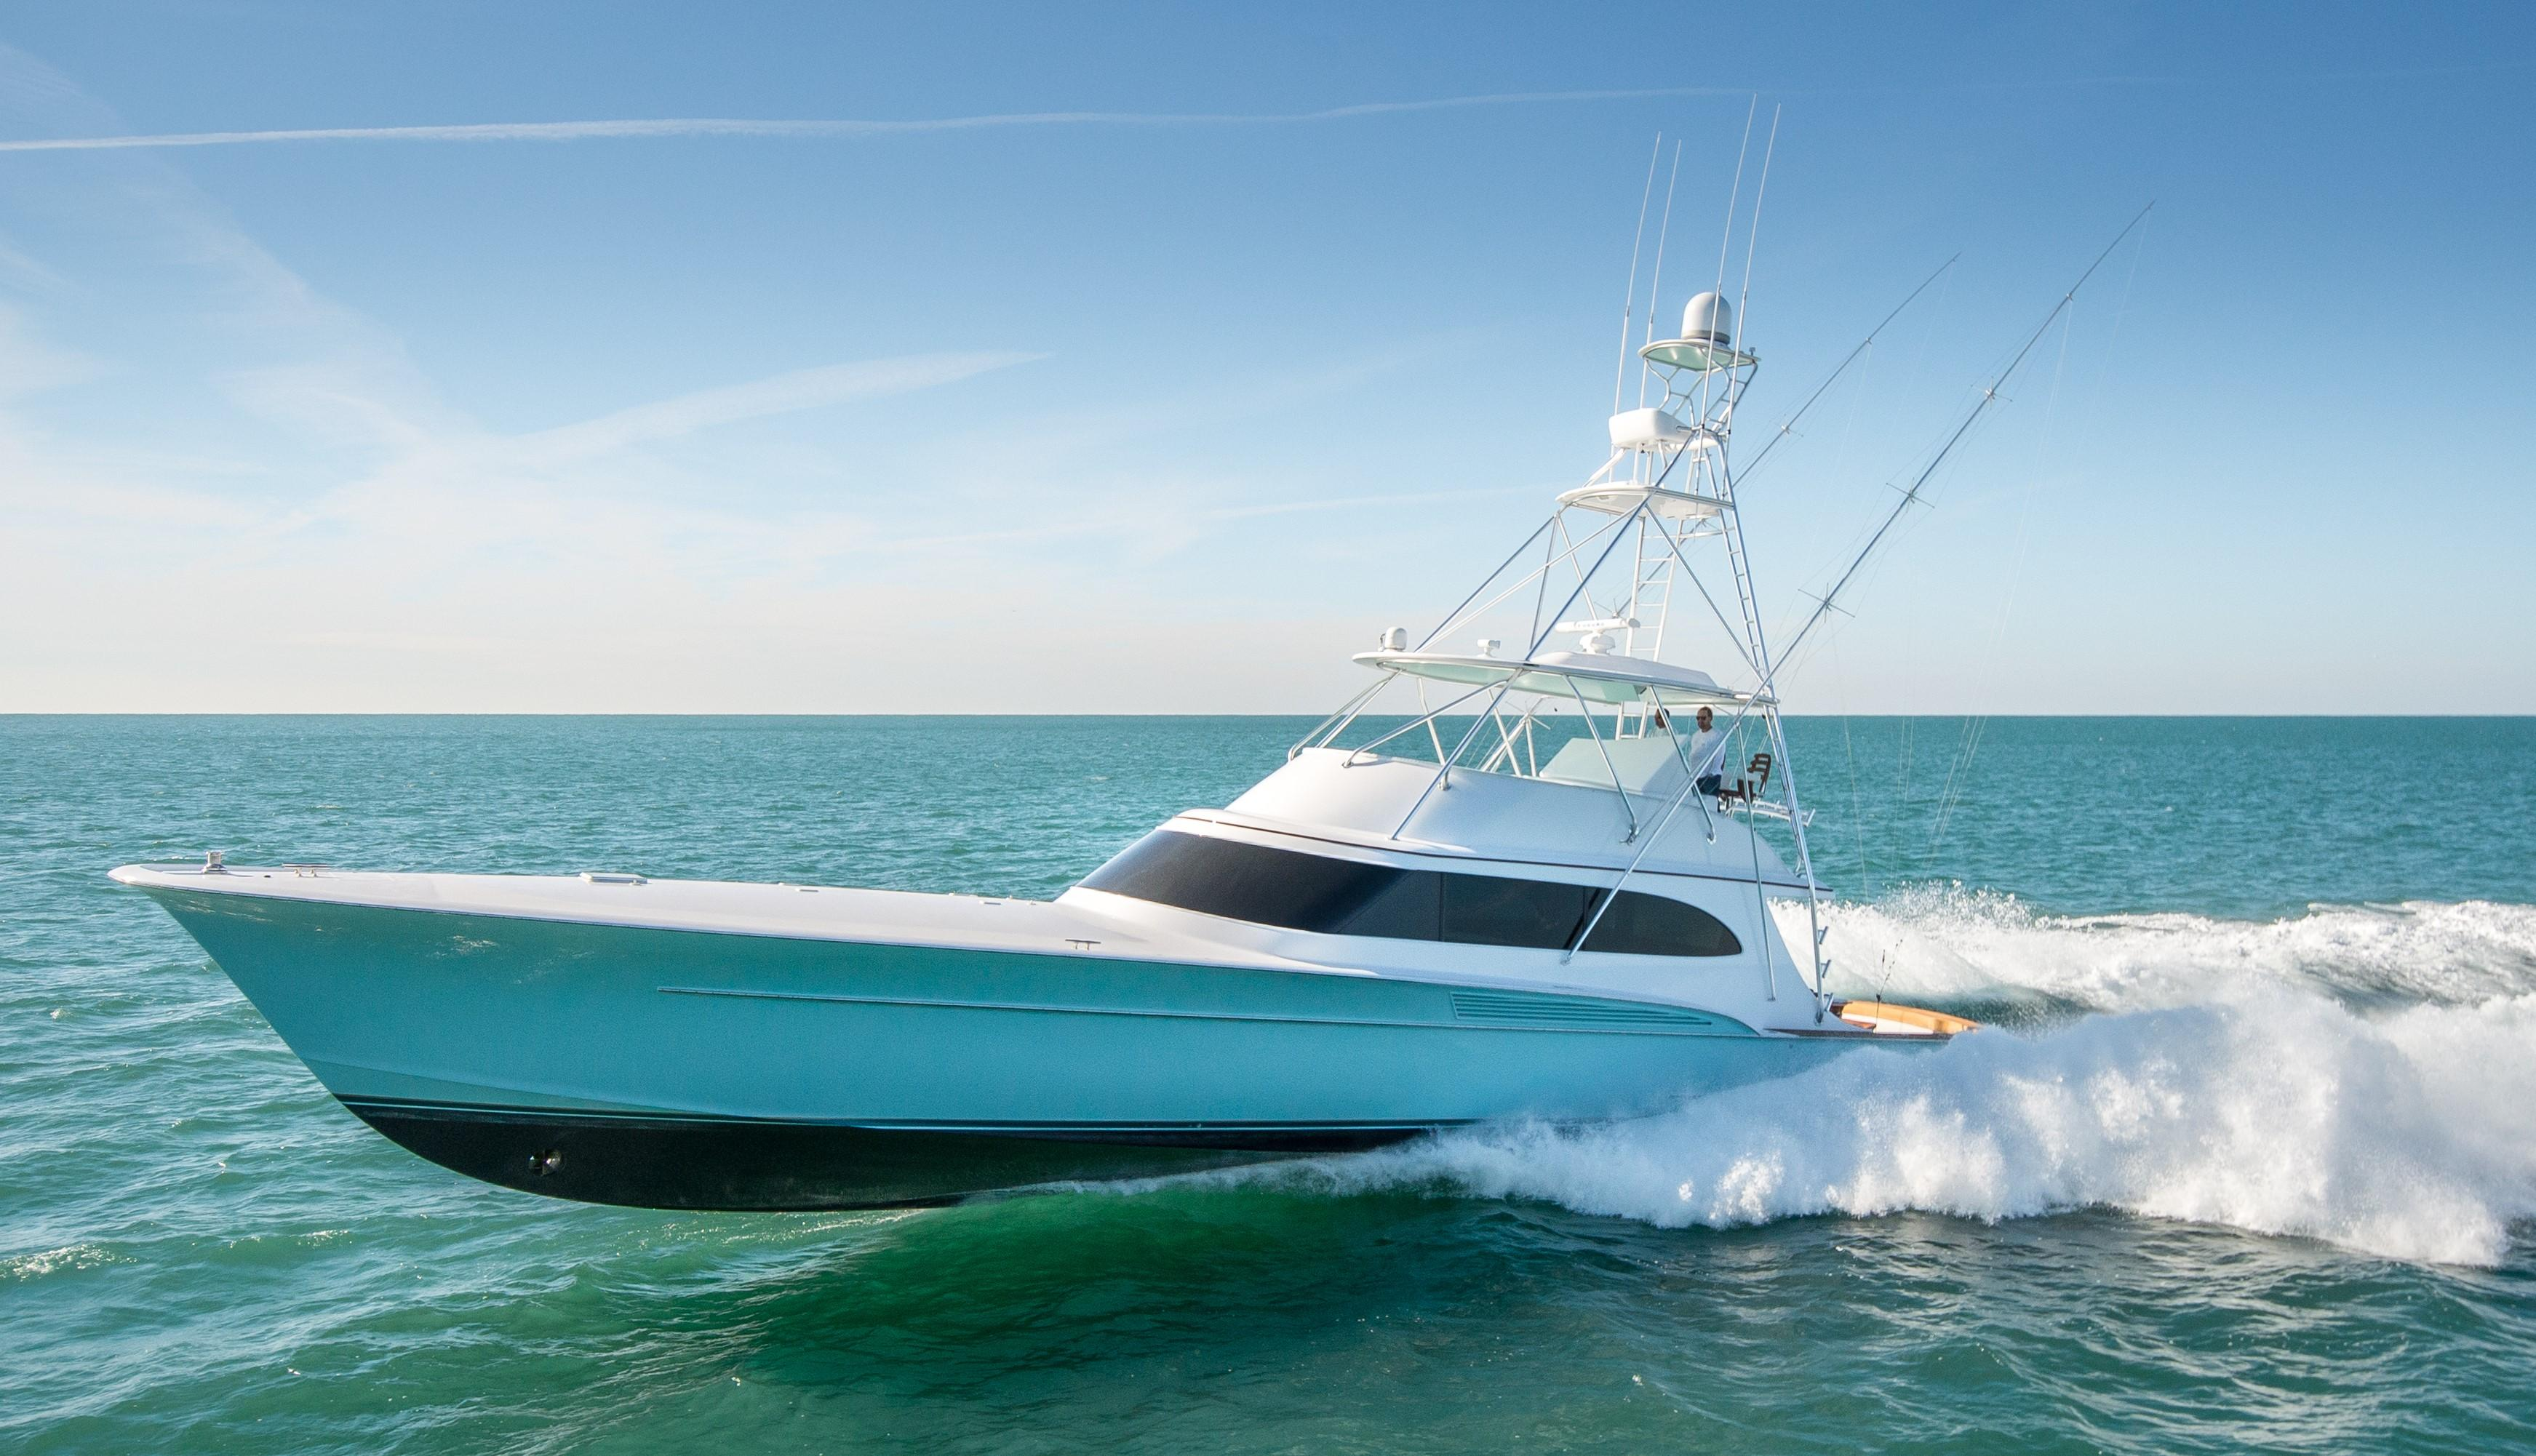 2011 RICKY SCARBOROUGH Custom Carolina Power Boat For Sale